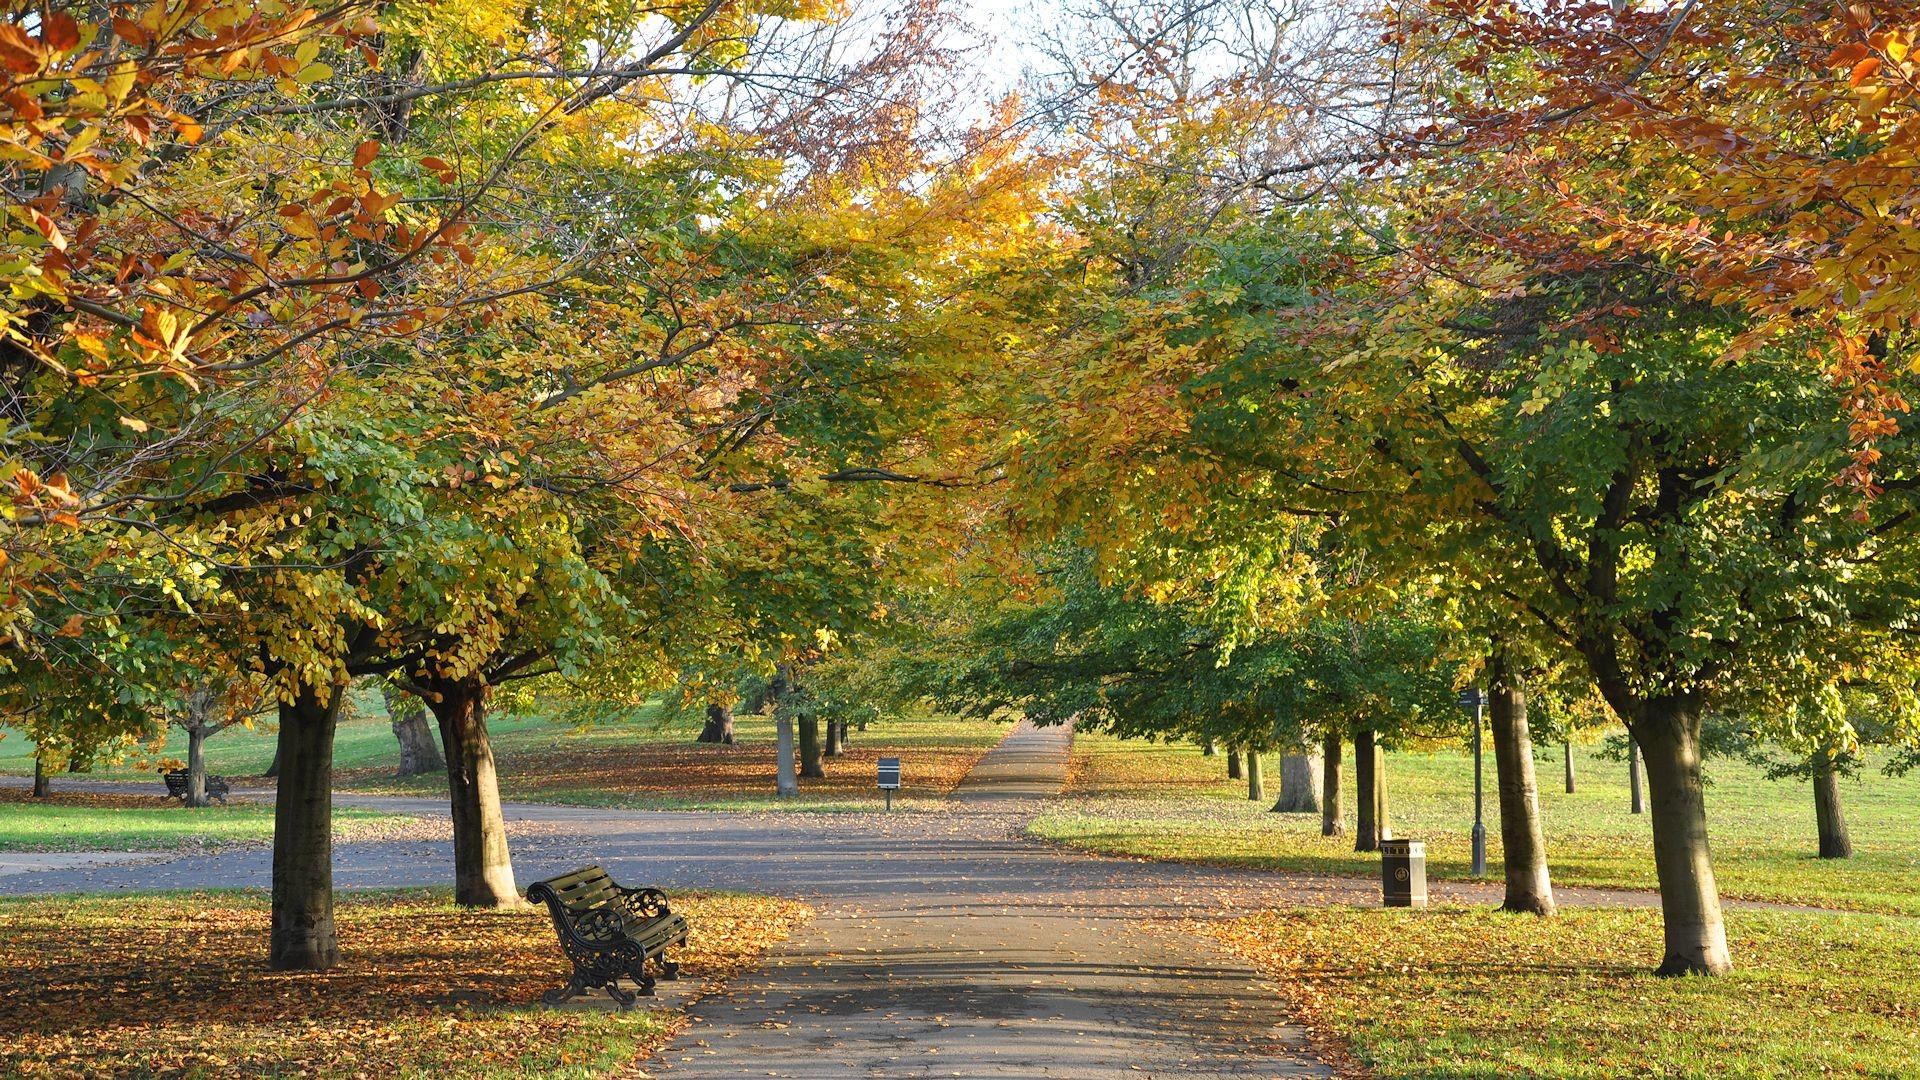 Autumn Nature wallpaper – 268462